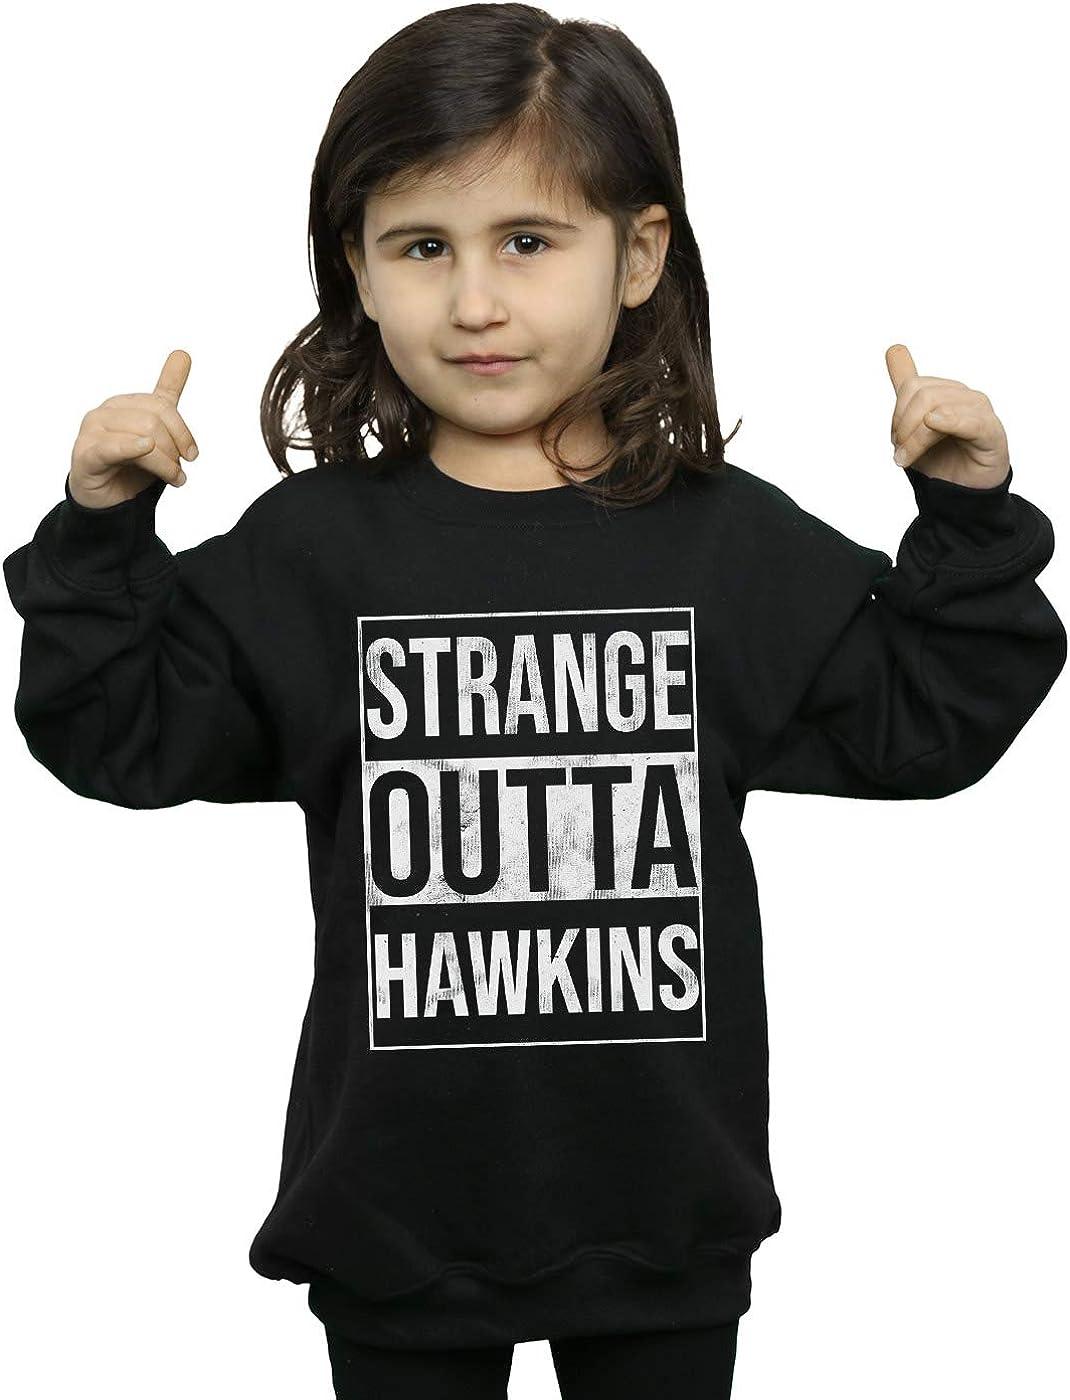 ABSOLUTECULT Drewbacca Girls Straight Outta Hawkins Sweatshirt